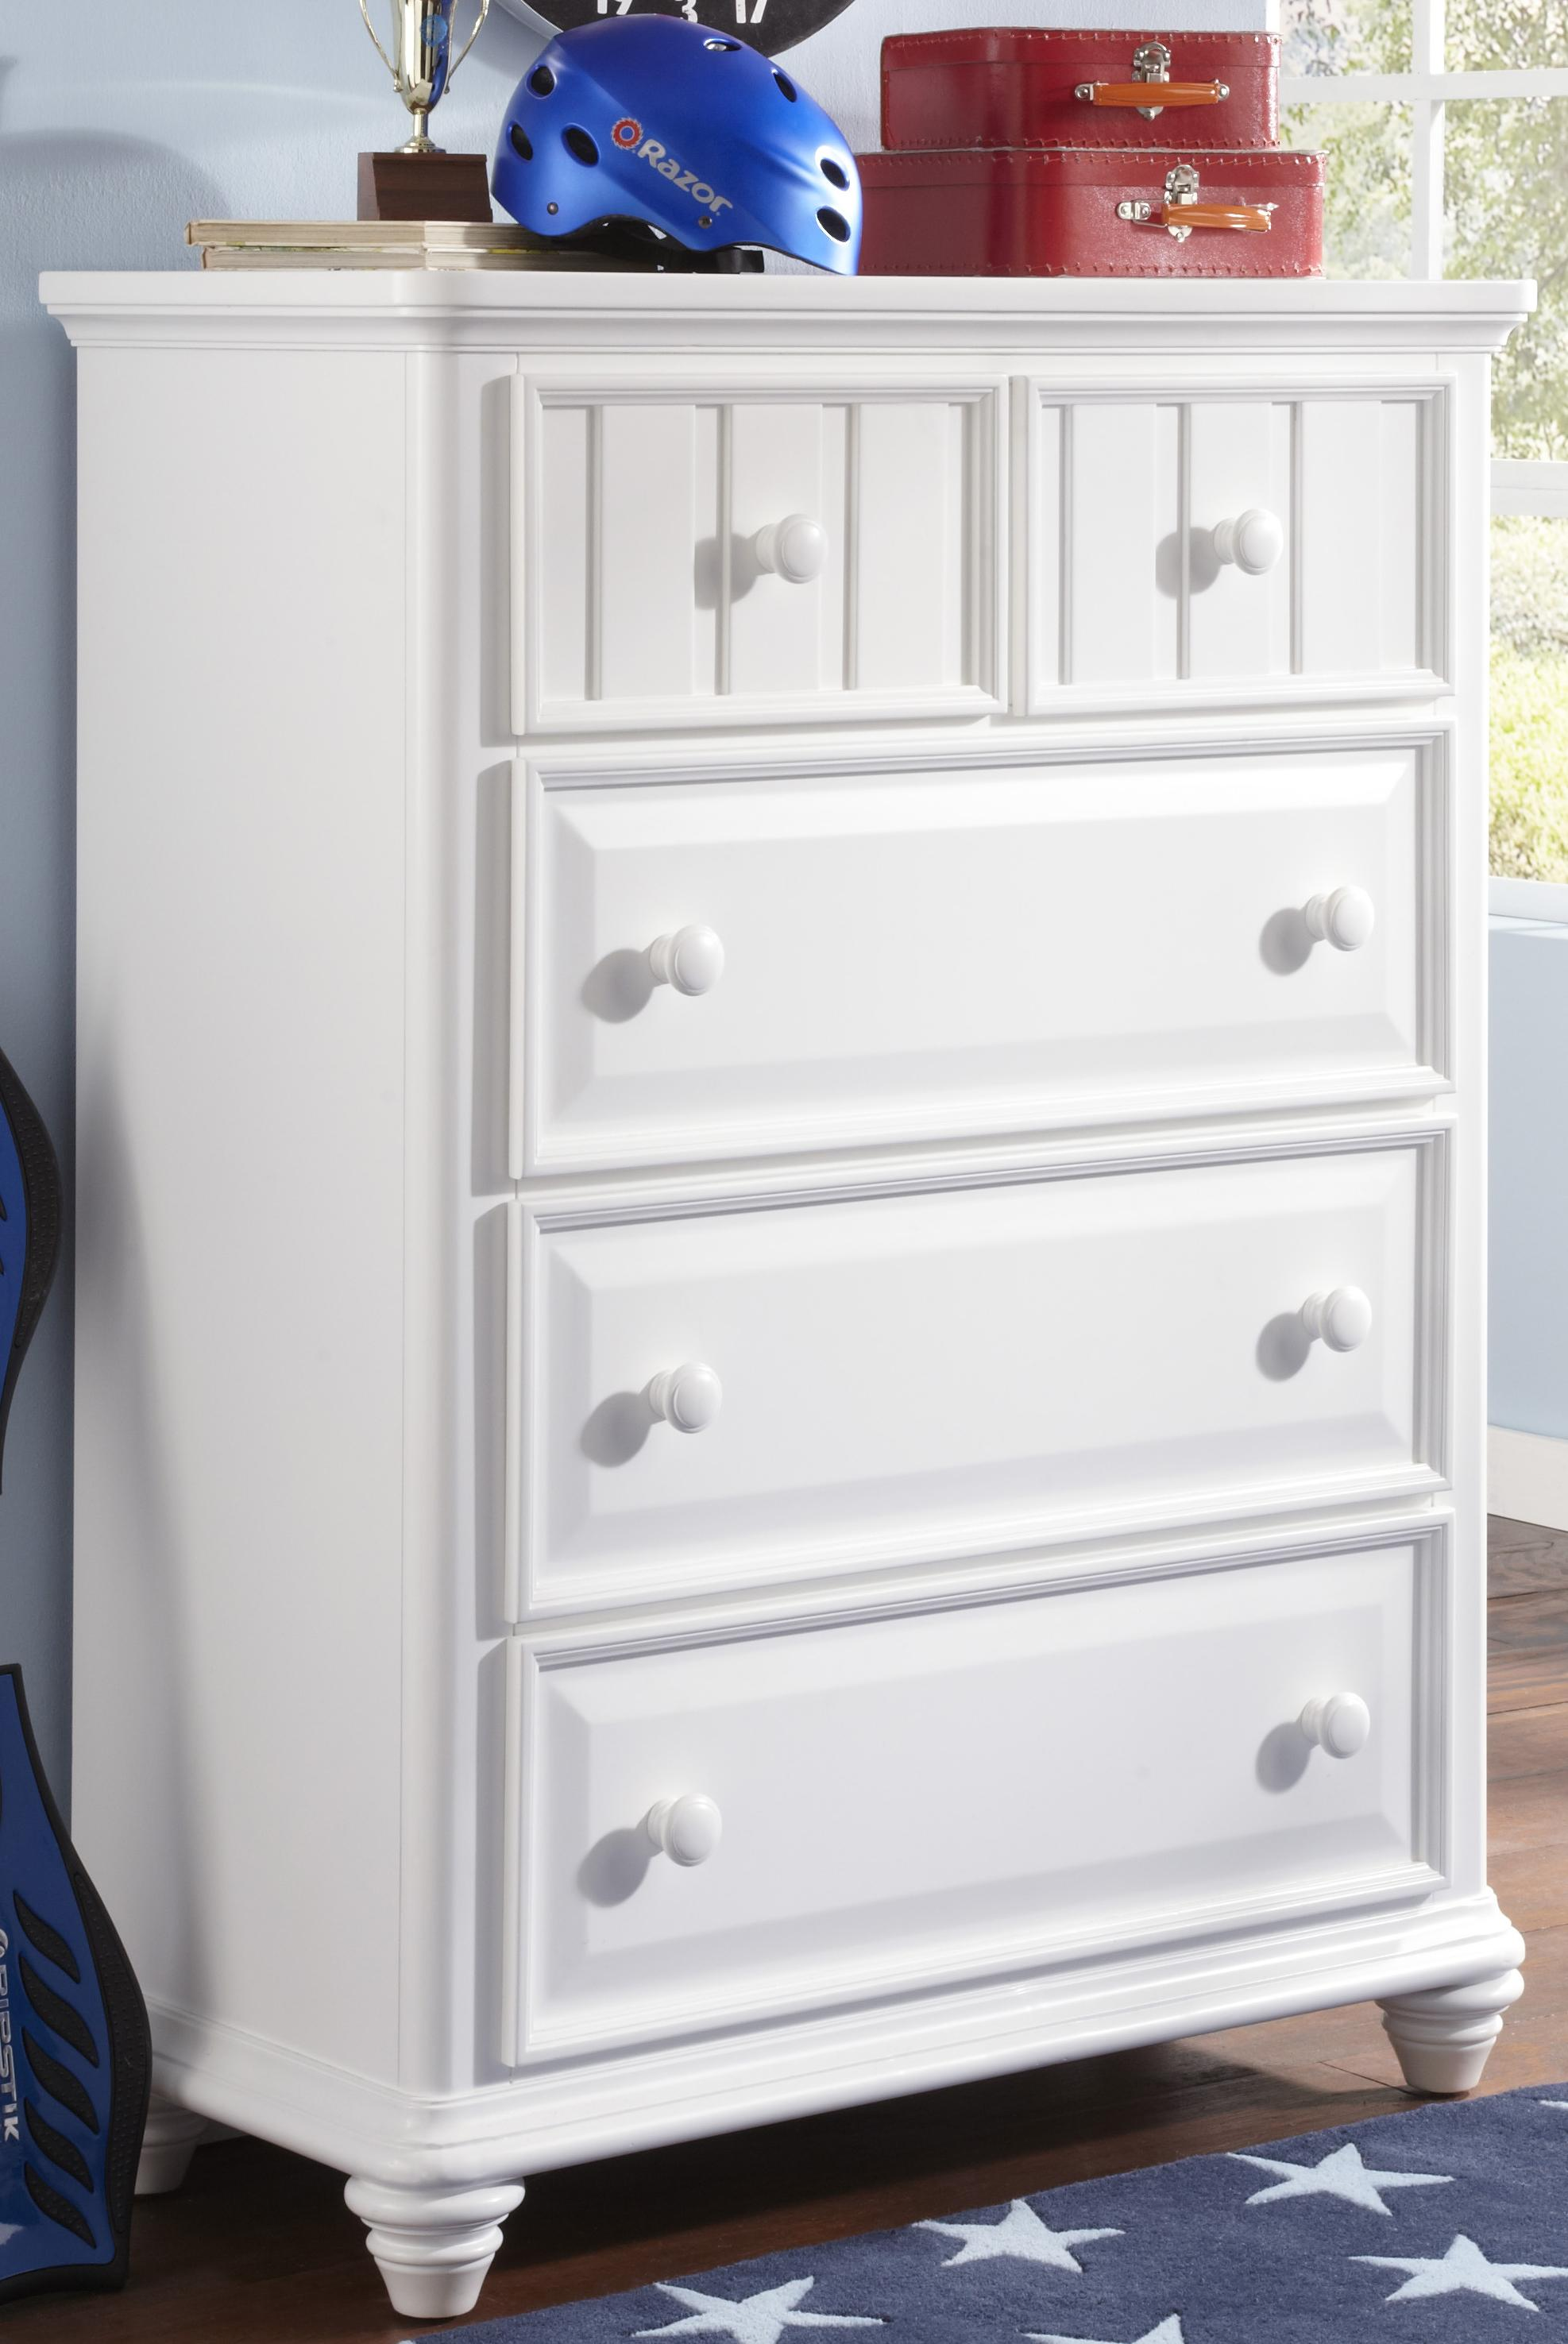 Morris Home Furnishings Shelbourne Shelbourne Chest - Item Number: 8466-440